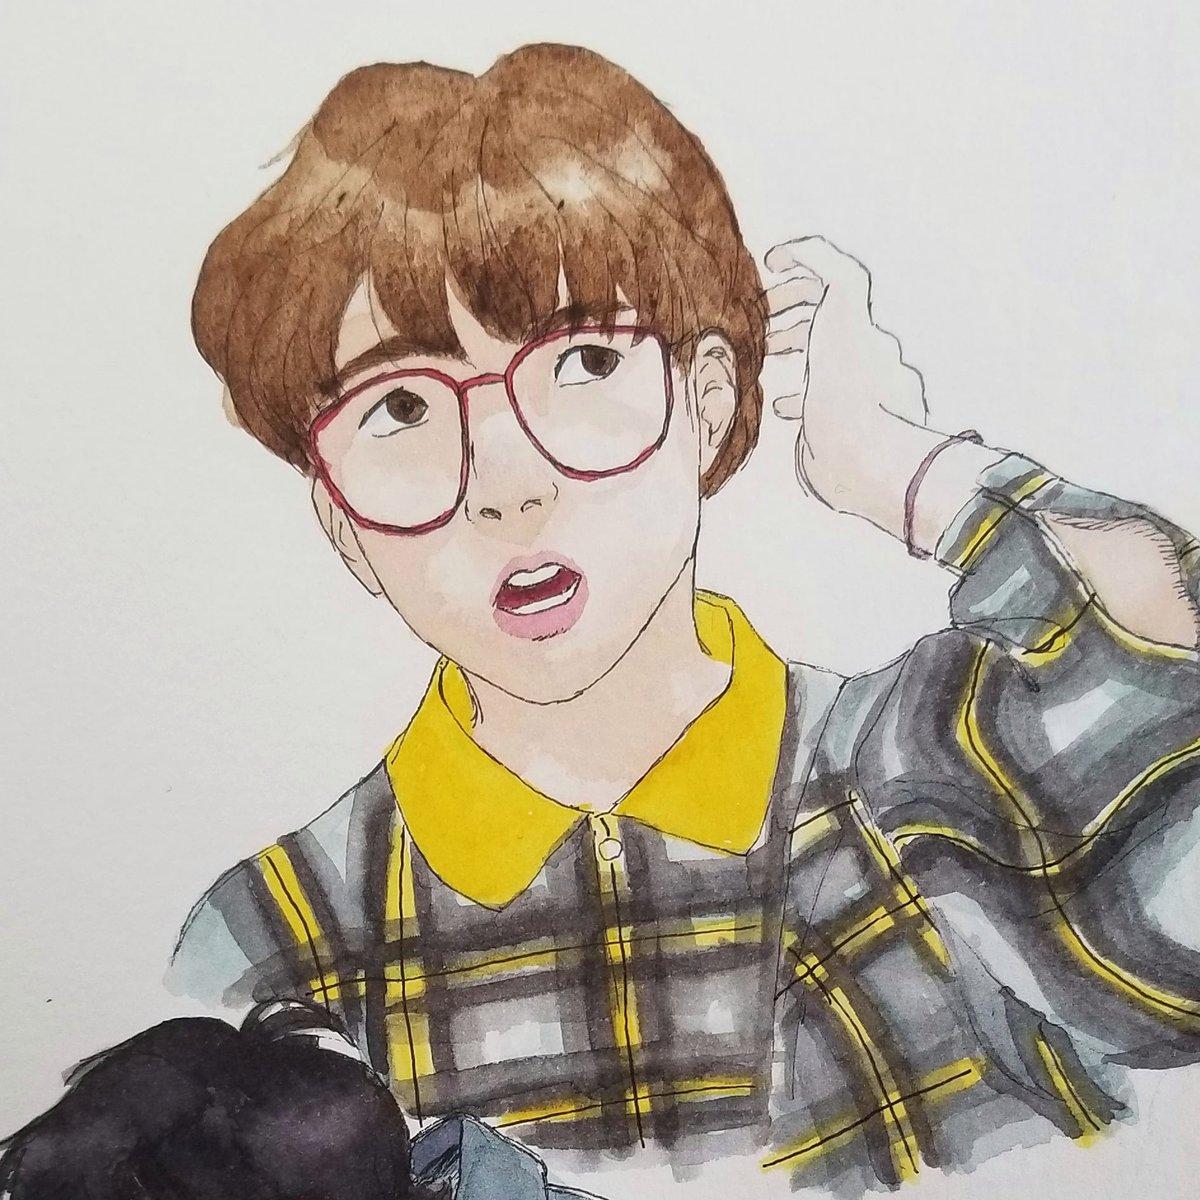 I like drawing #watercolor #portraits  pic.twitter.com/ZfQP3q97Jd